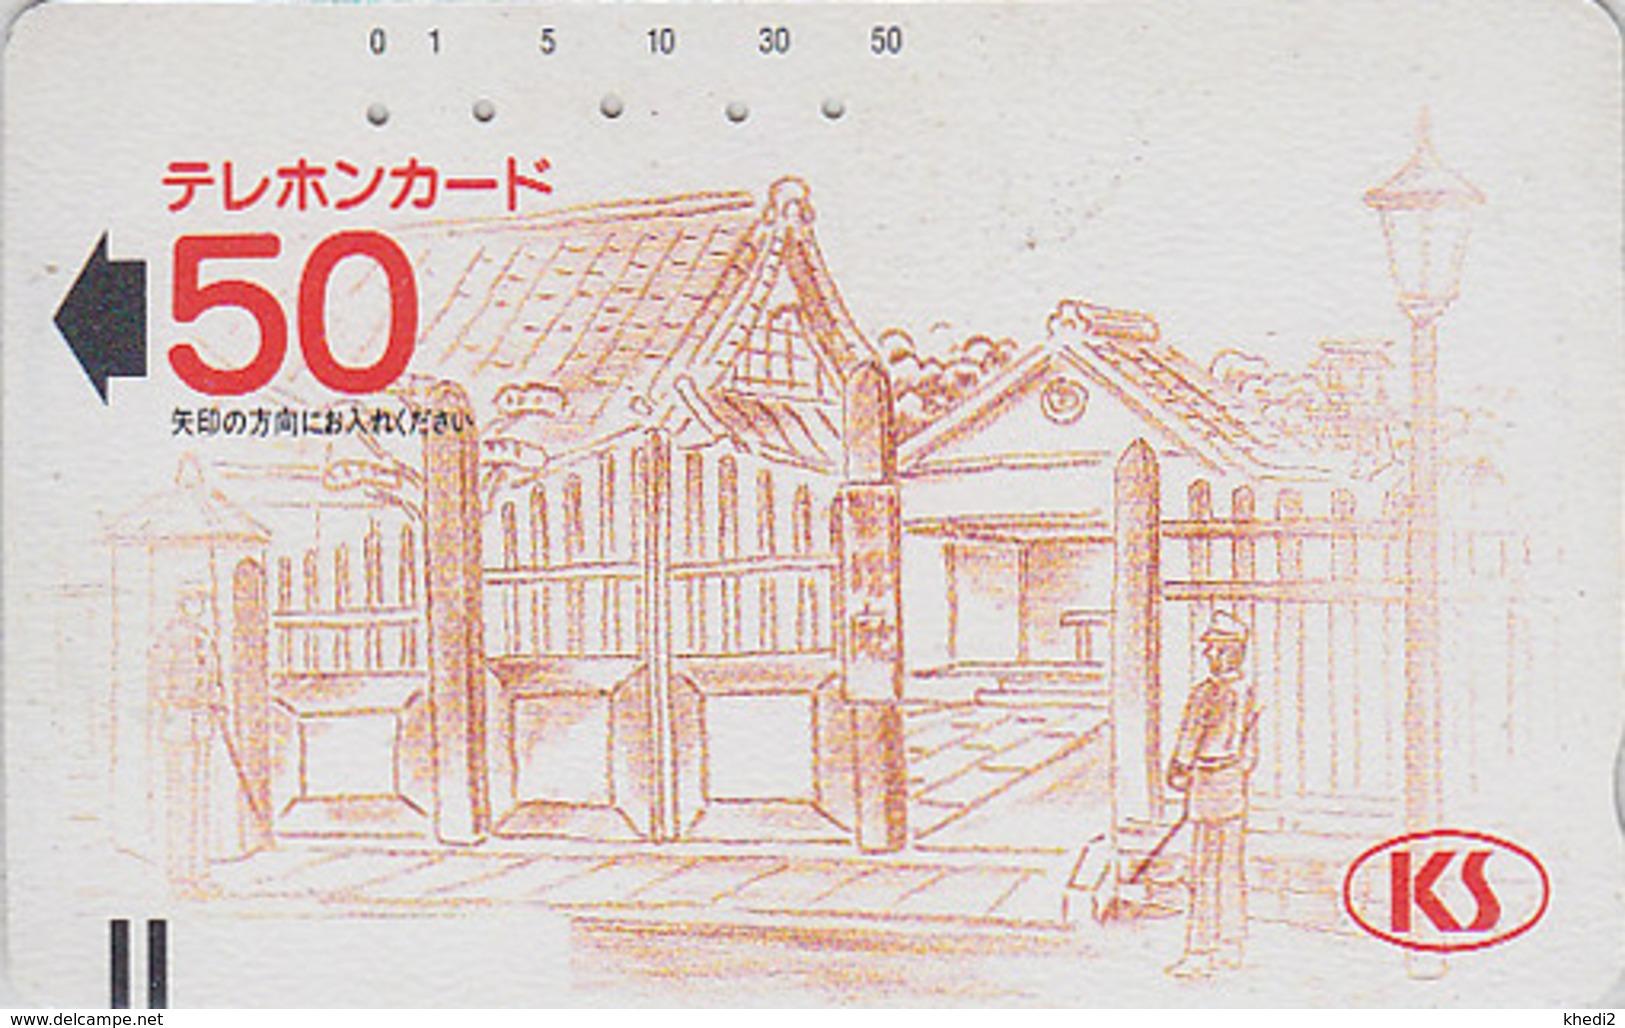 Télécarte Ancienne Japon / 110-7229 - Village Dessin - Painting Drawing Japan Front Bar Phonecard / A - Balken TK - Japan